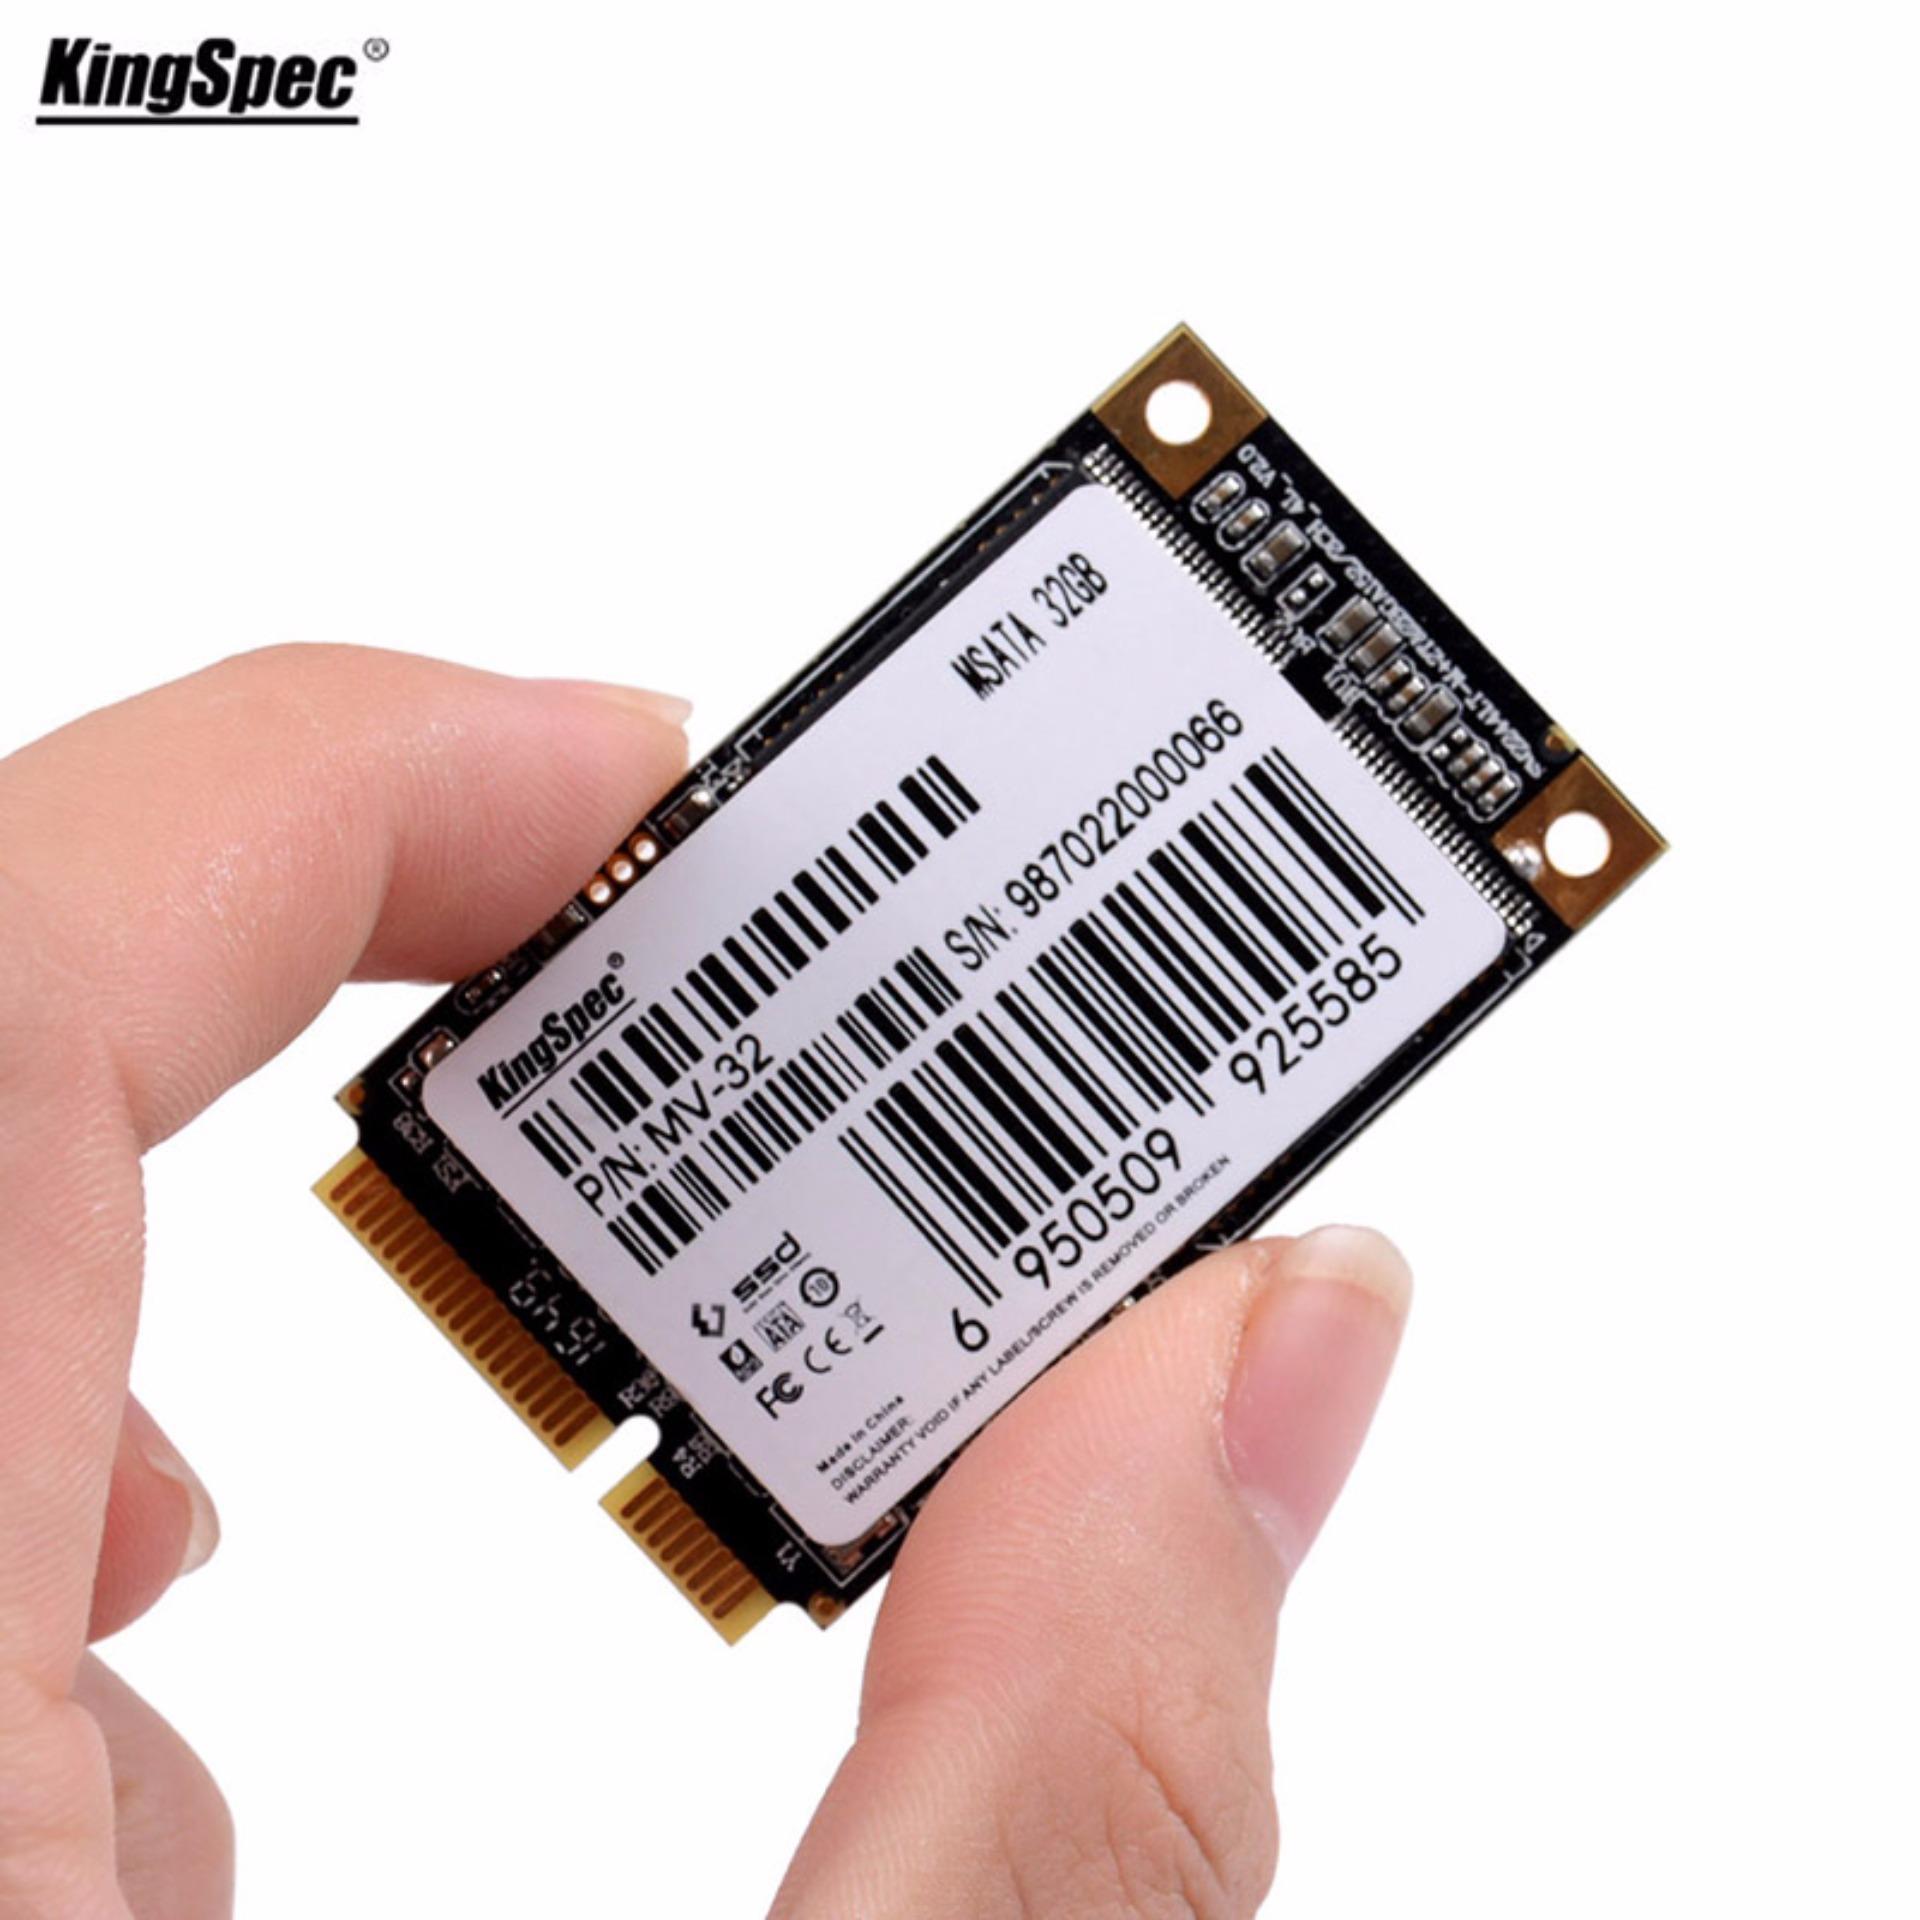 KingSpec 32 GB Mini PCI-E MSATA 4,57 cm 6 GB/S